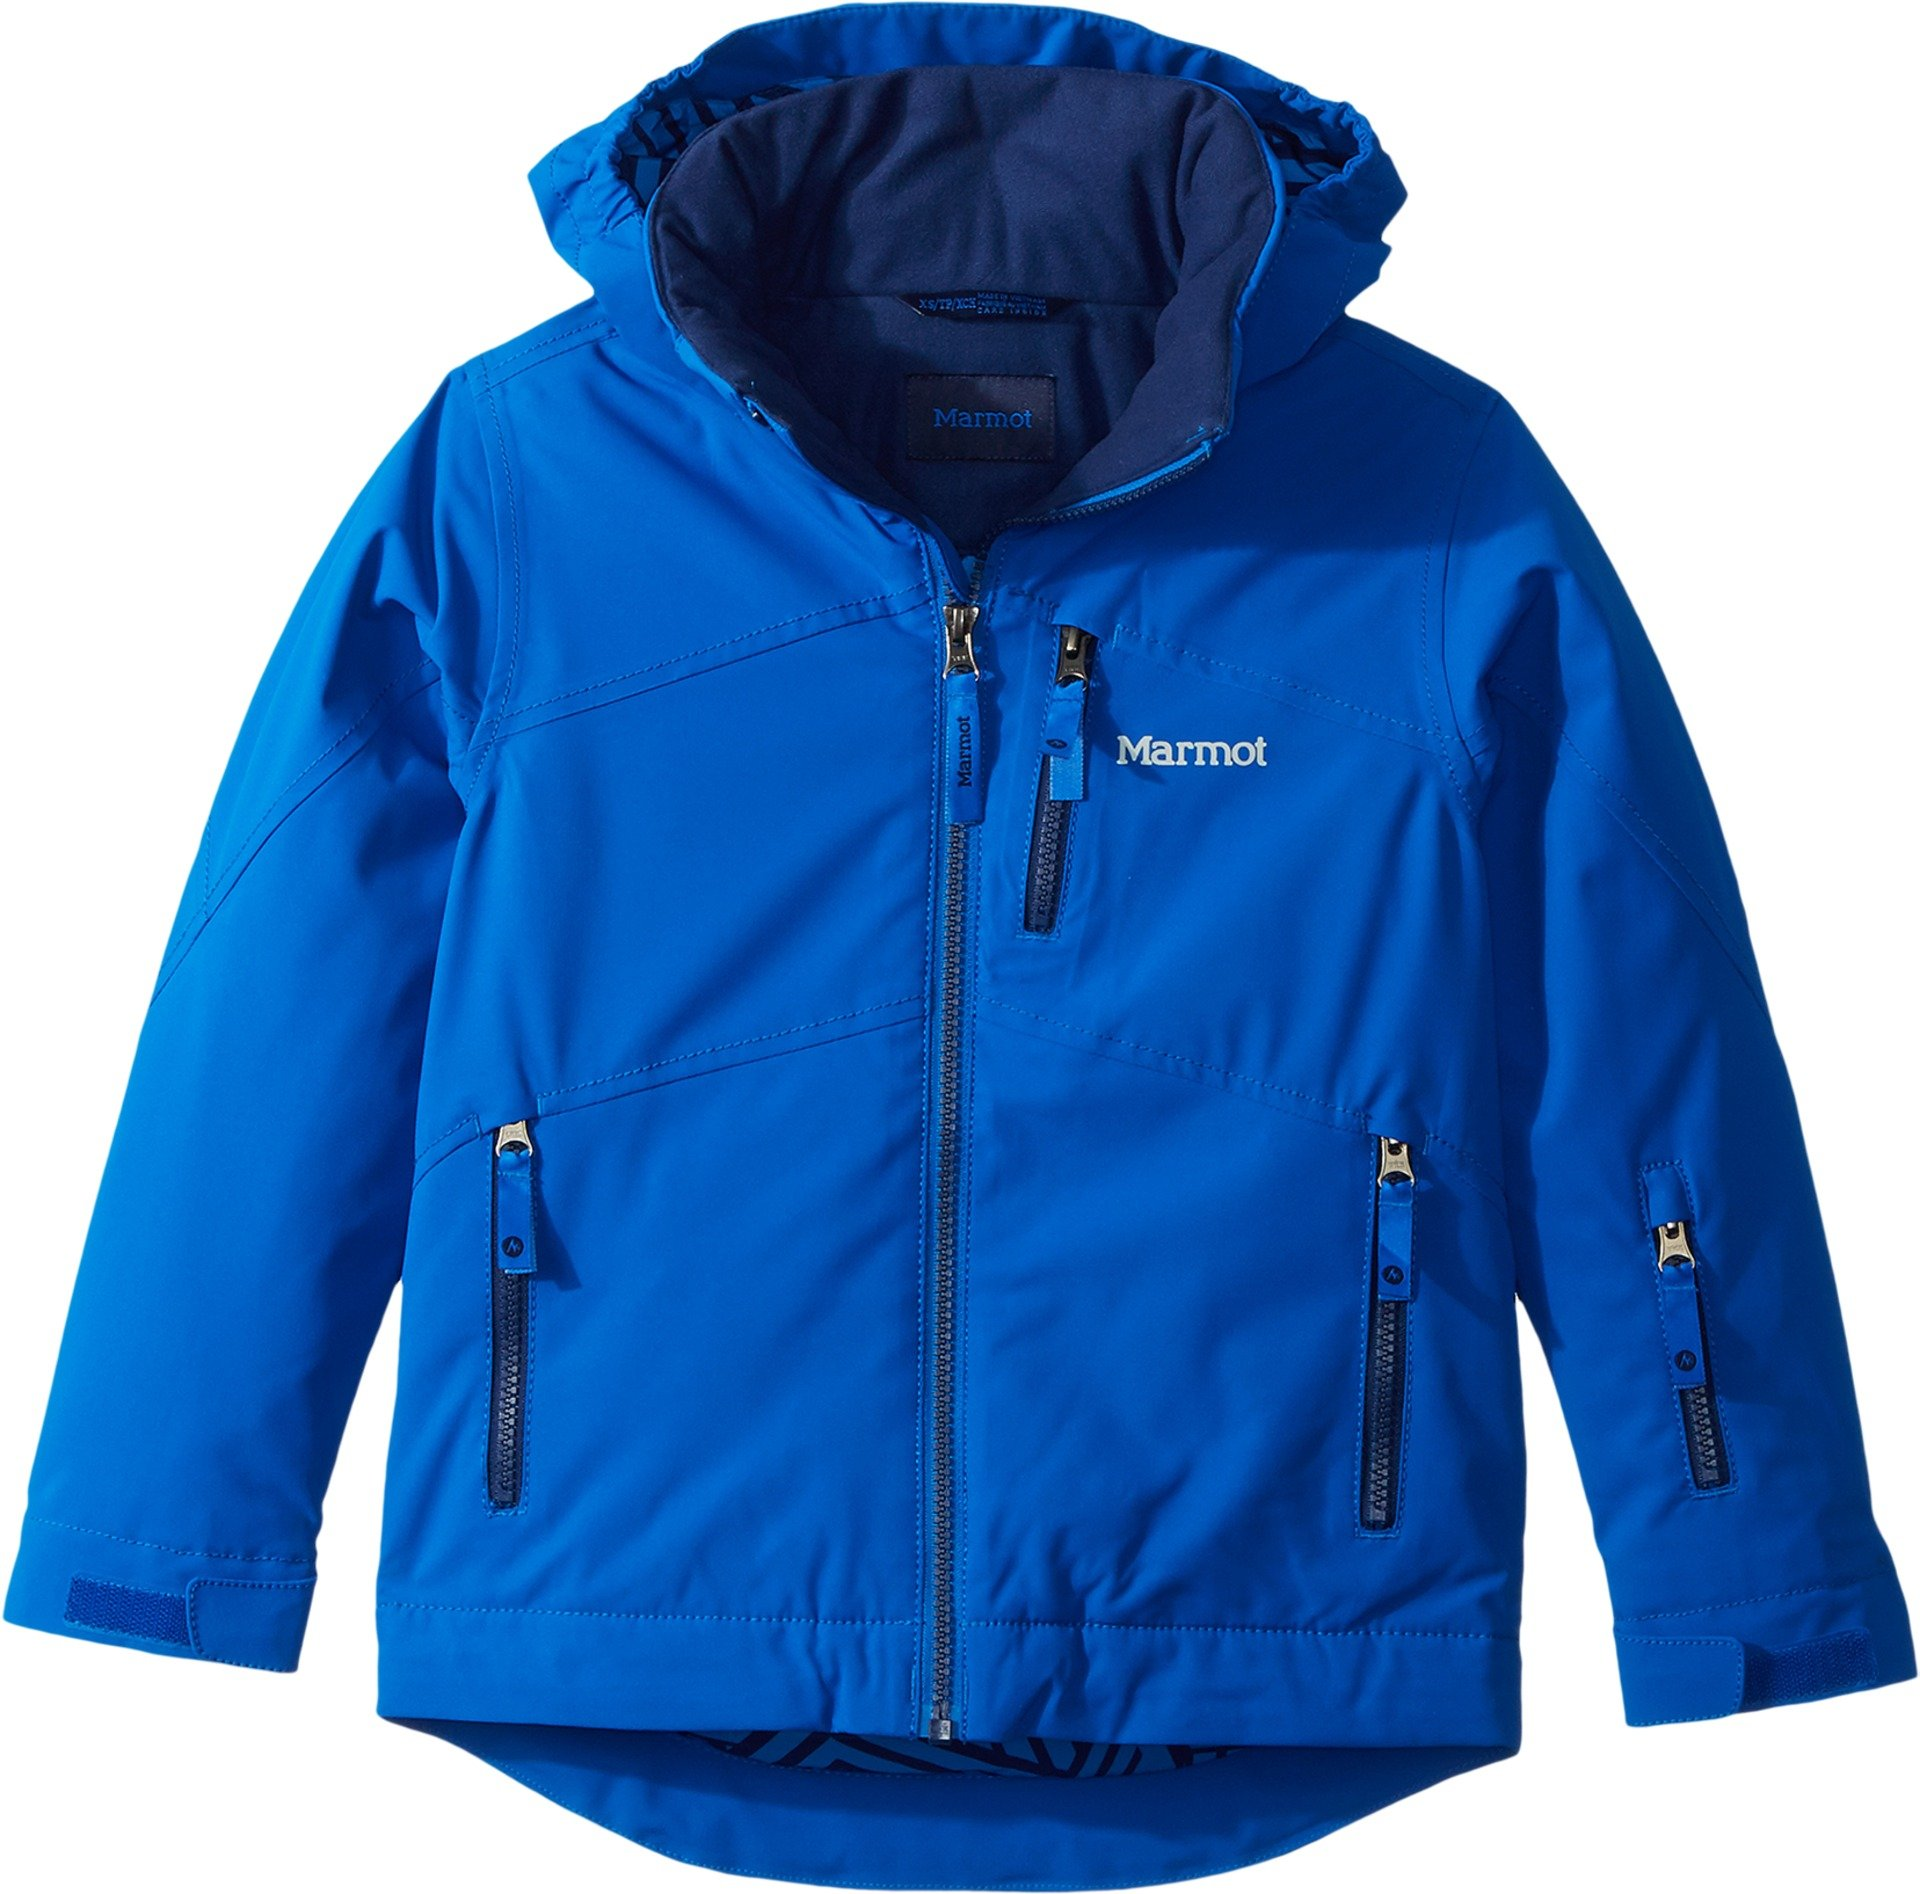 Marmot Kids Boy's Ripsaw Jacket (Little Kids/Big Kids) True Blue X-Small